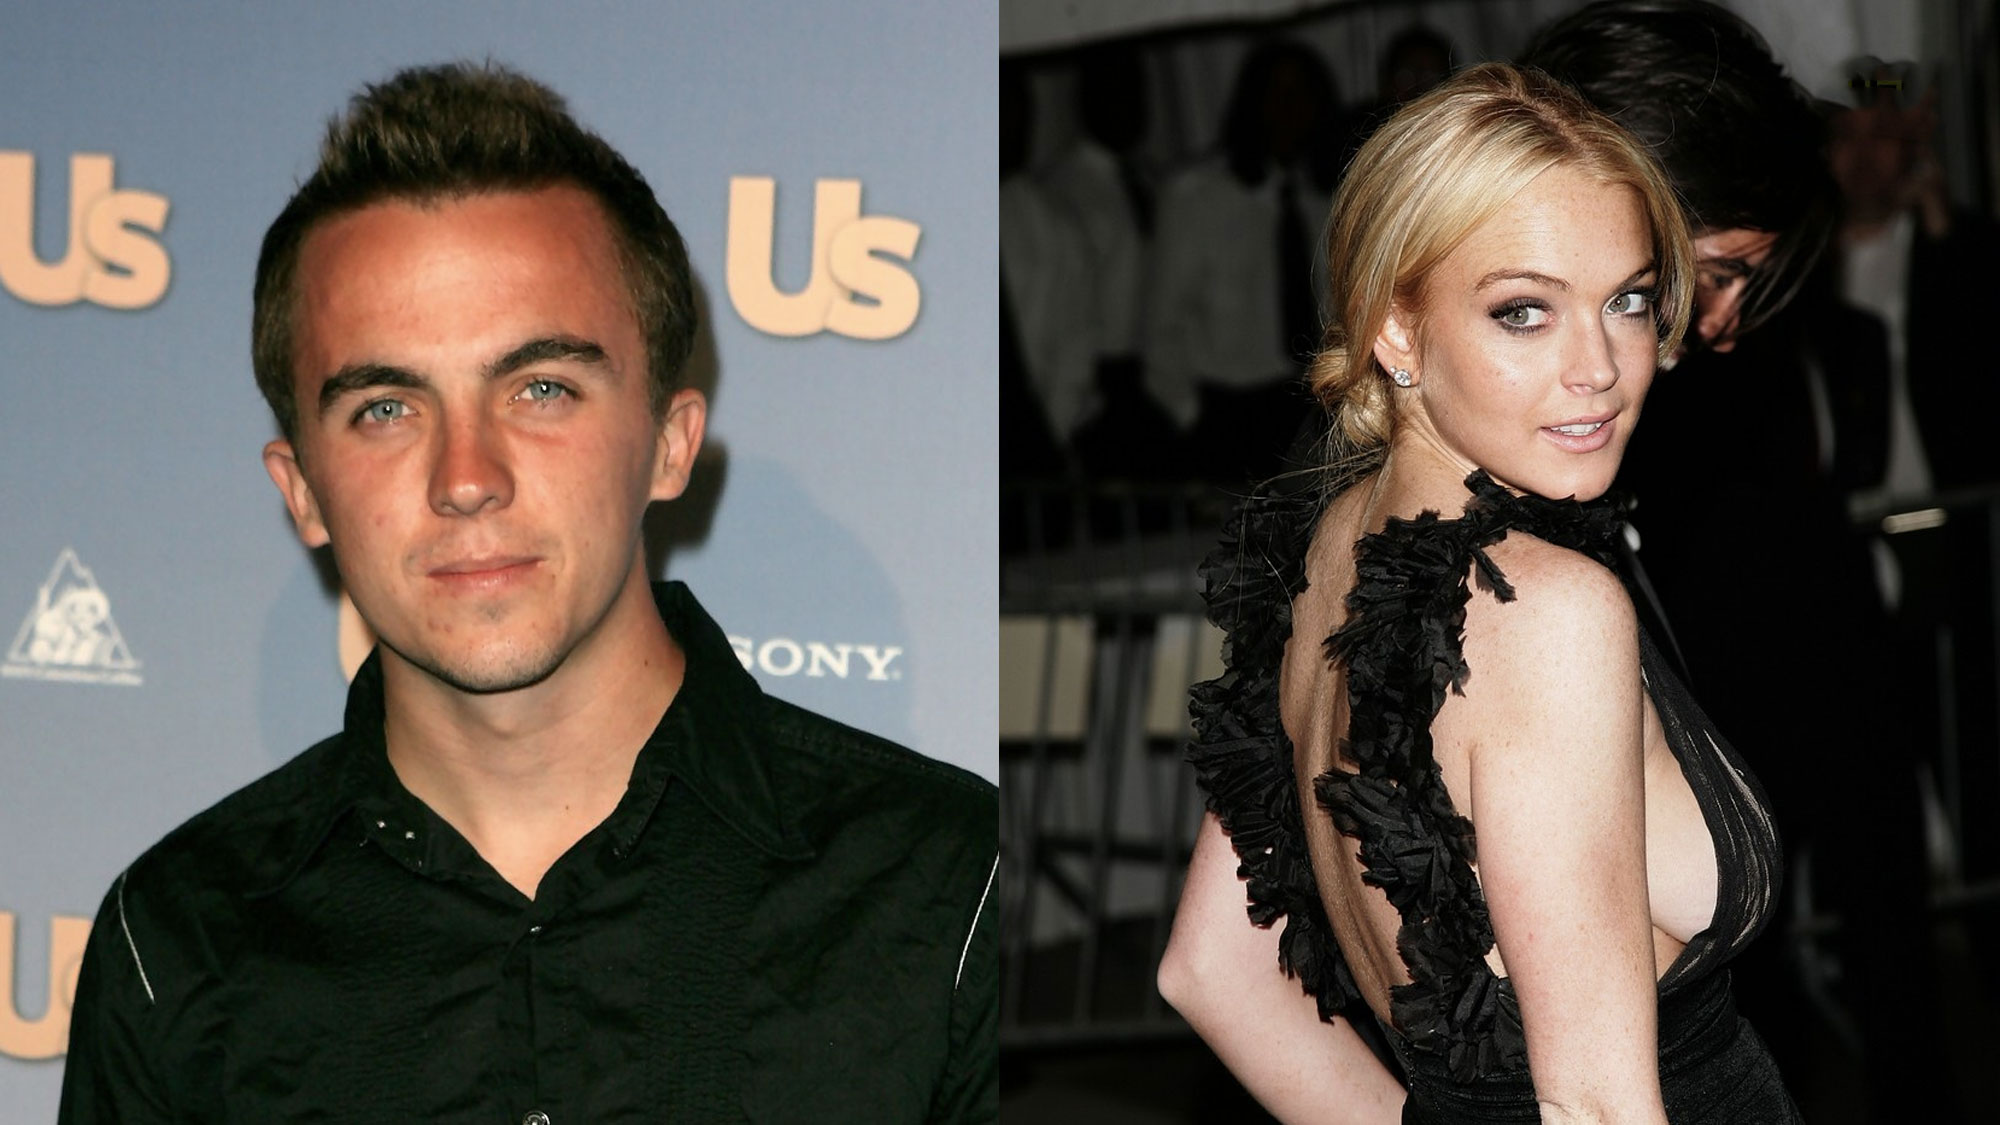 Quand Frankie Muniz tâcle Lindsay Lohan…